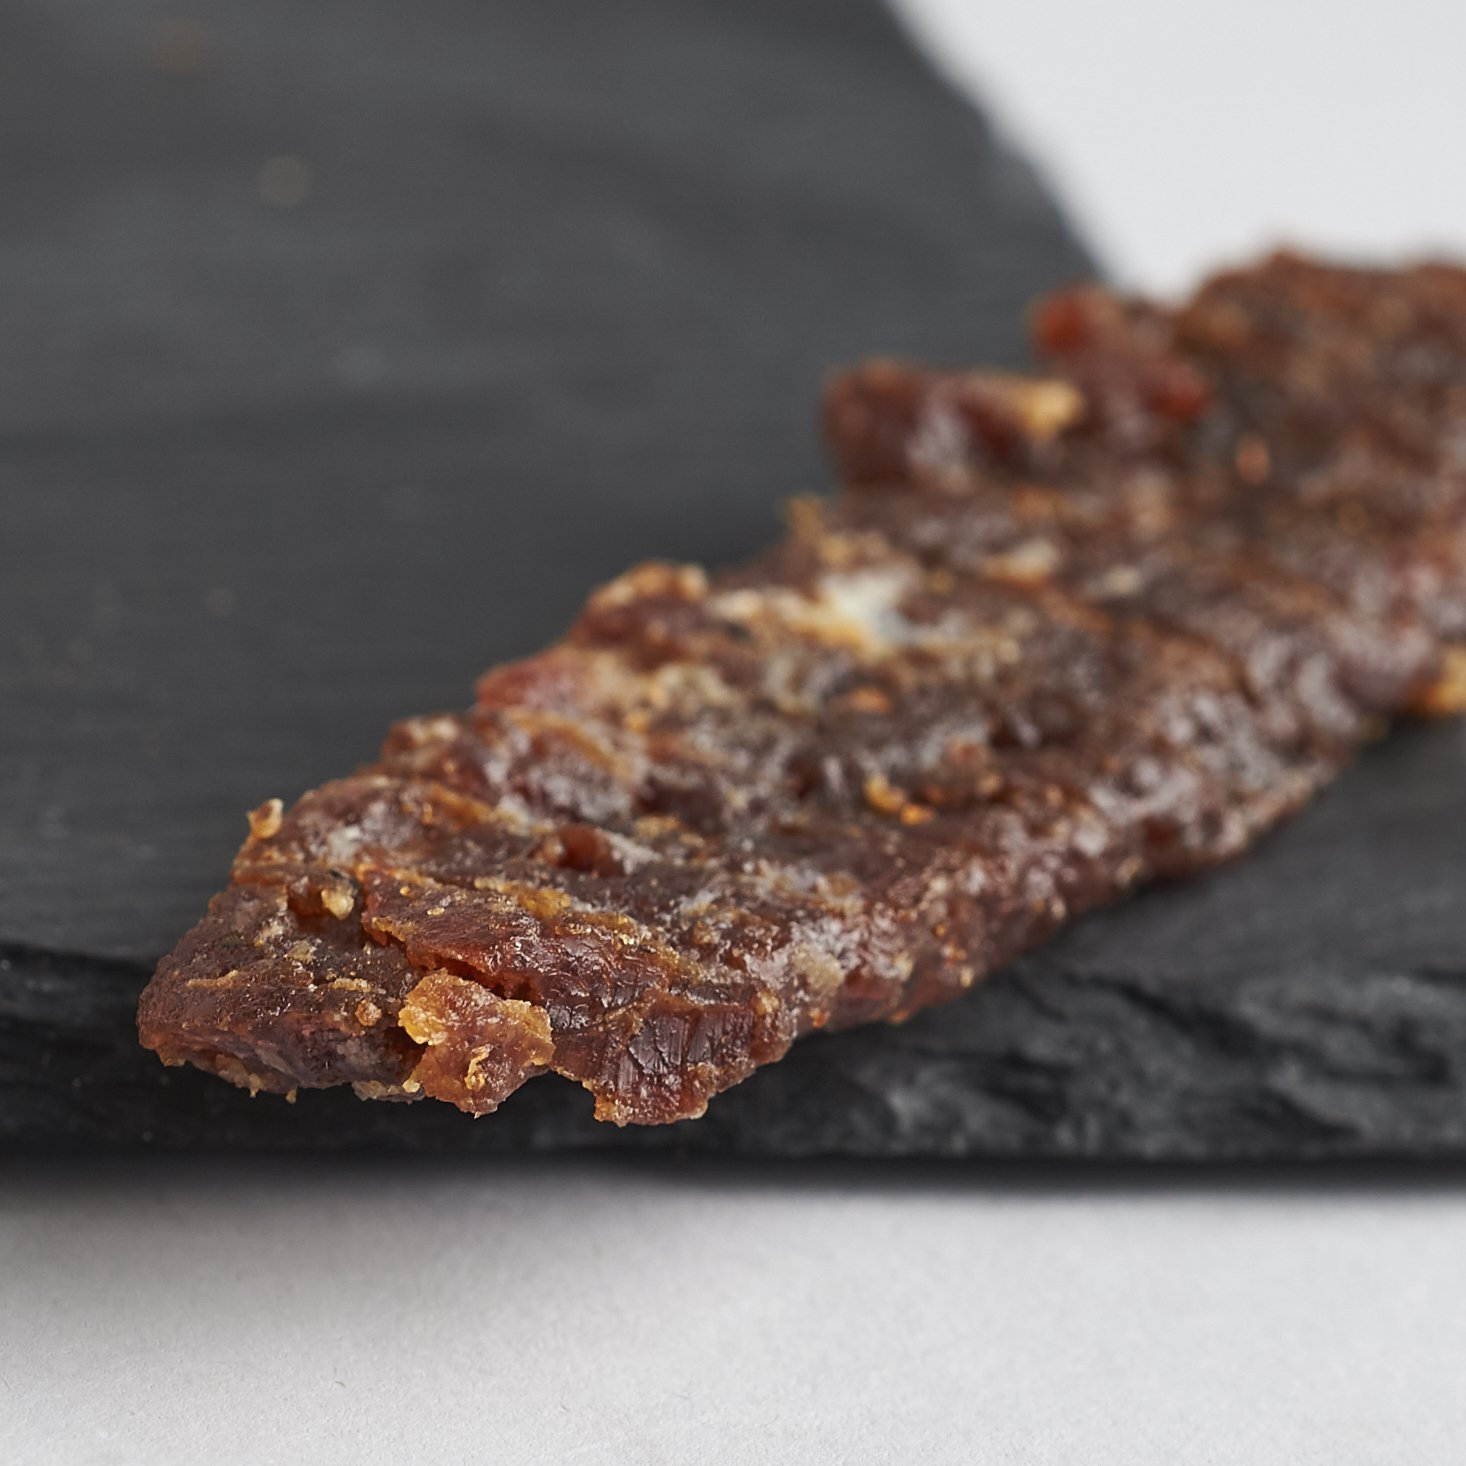 People's Choice Beef Jerky - Tasting Kitchen - Orange Honey Teriyaki - Gourmet Handmade Craft Meat Snack - 1 Pound Bag by People's Choice Beef Jerky (Image #3)